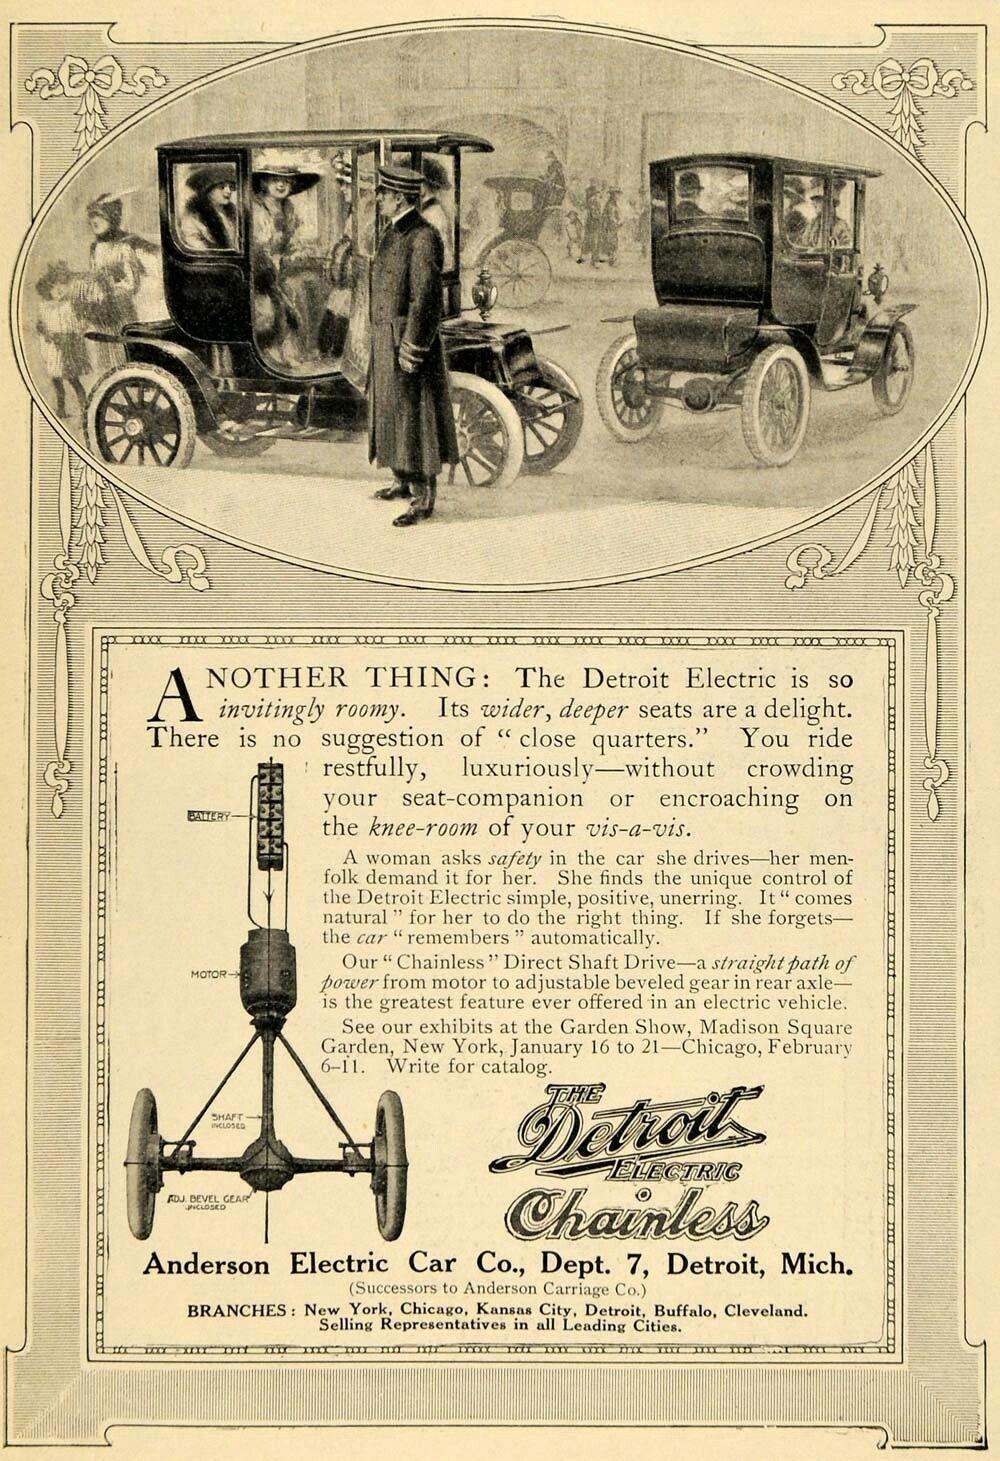 medium resolution of anderson electric car co